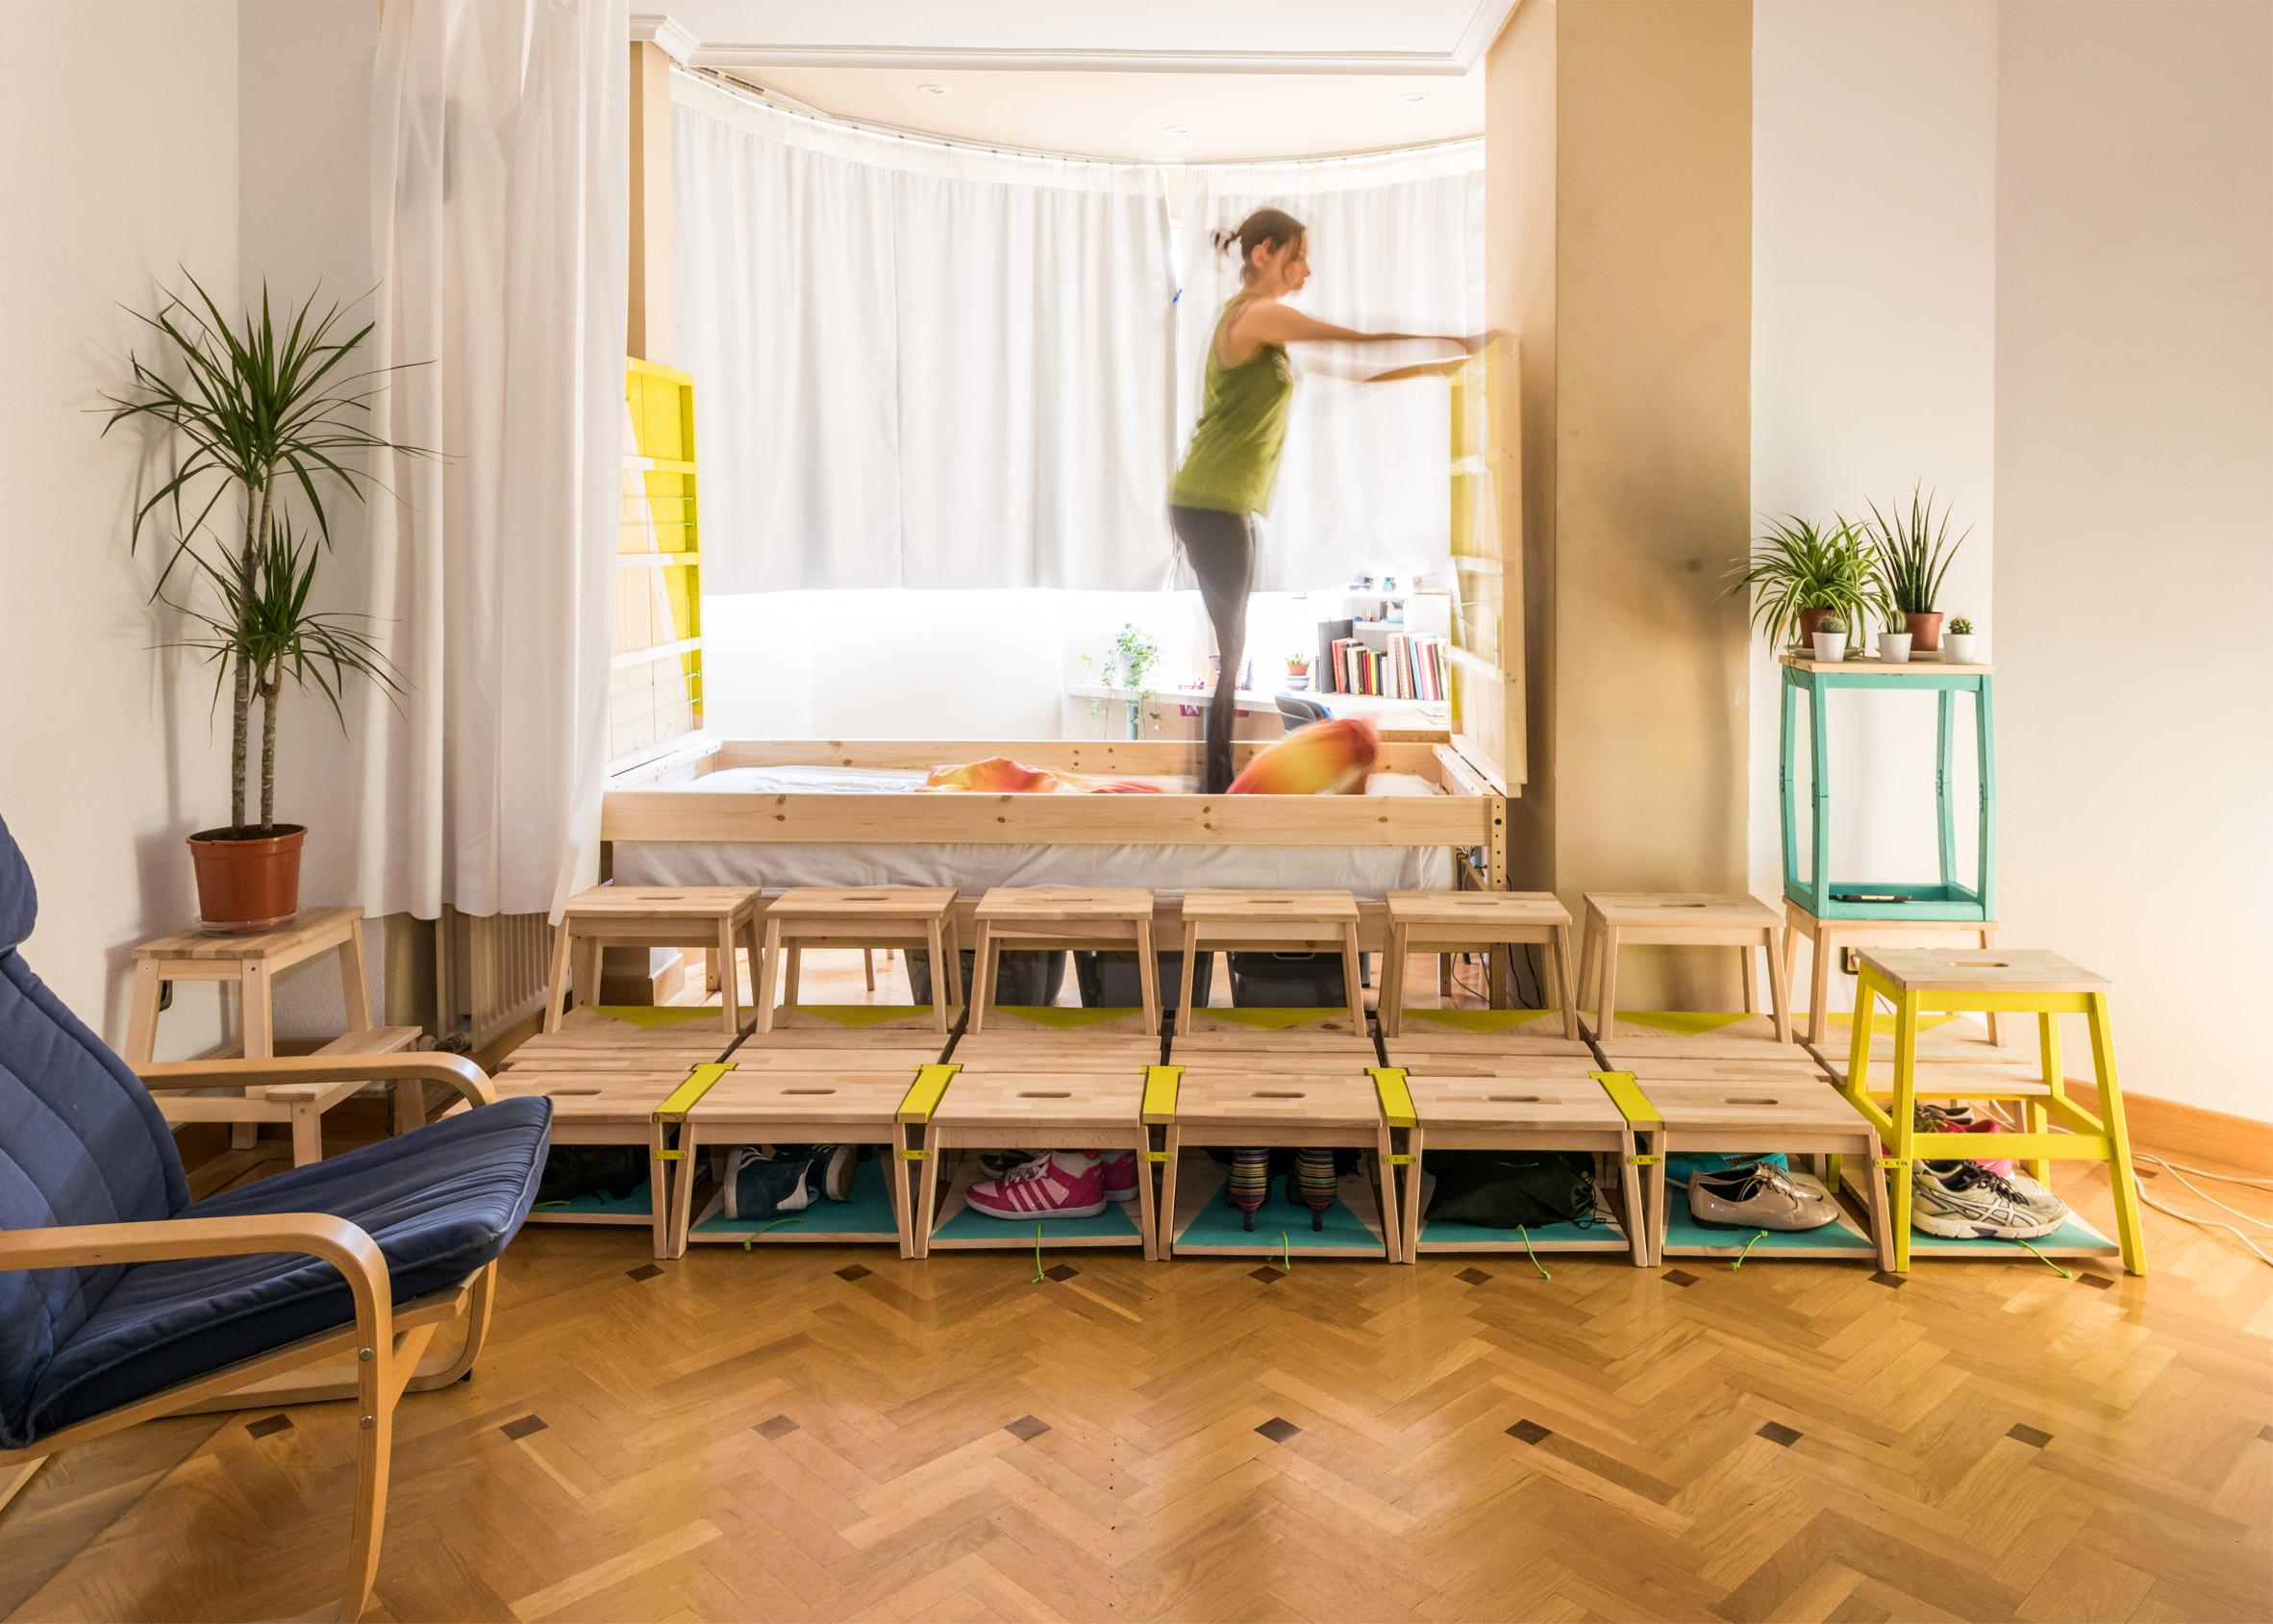 Oslo Triennale: Home Back Home